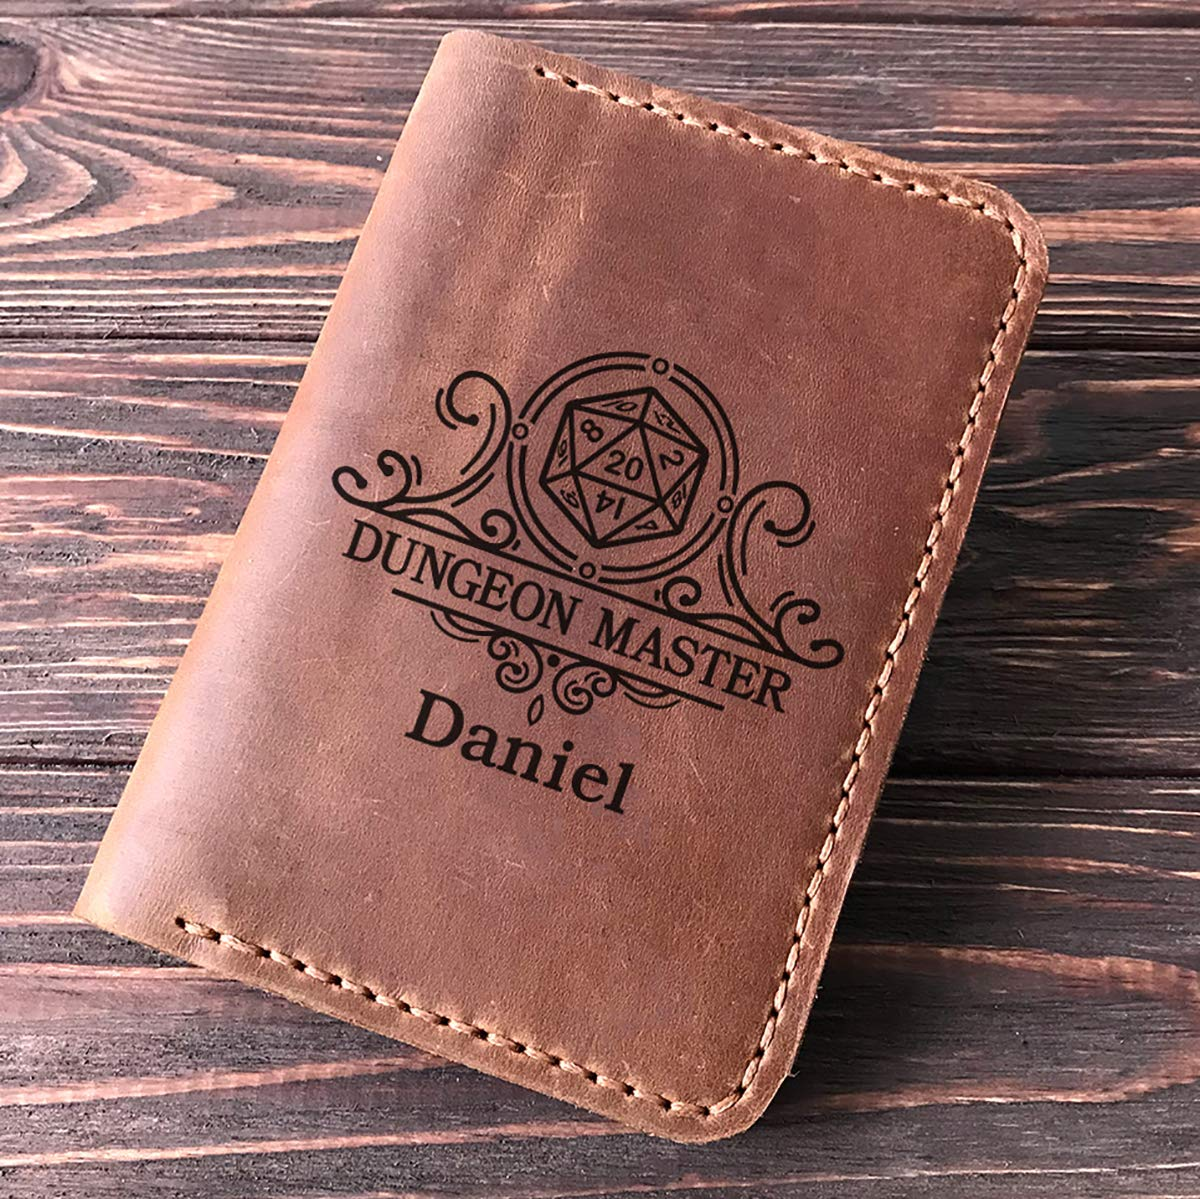 Gamer Gift D/&D Personalized Passport Cover Passport Cover Passport Case Geek Gift k44 Dungeon and Dragons Personalized Passport Wallet Dungeon Master Leather Passport Holder Gift for Traveler